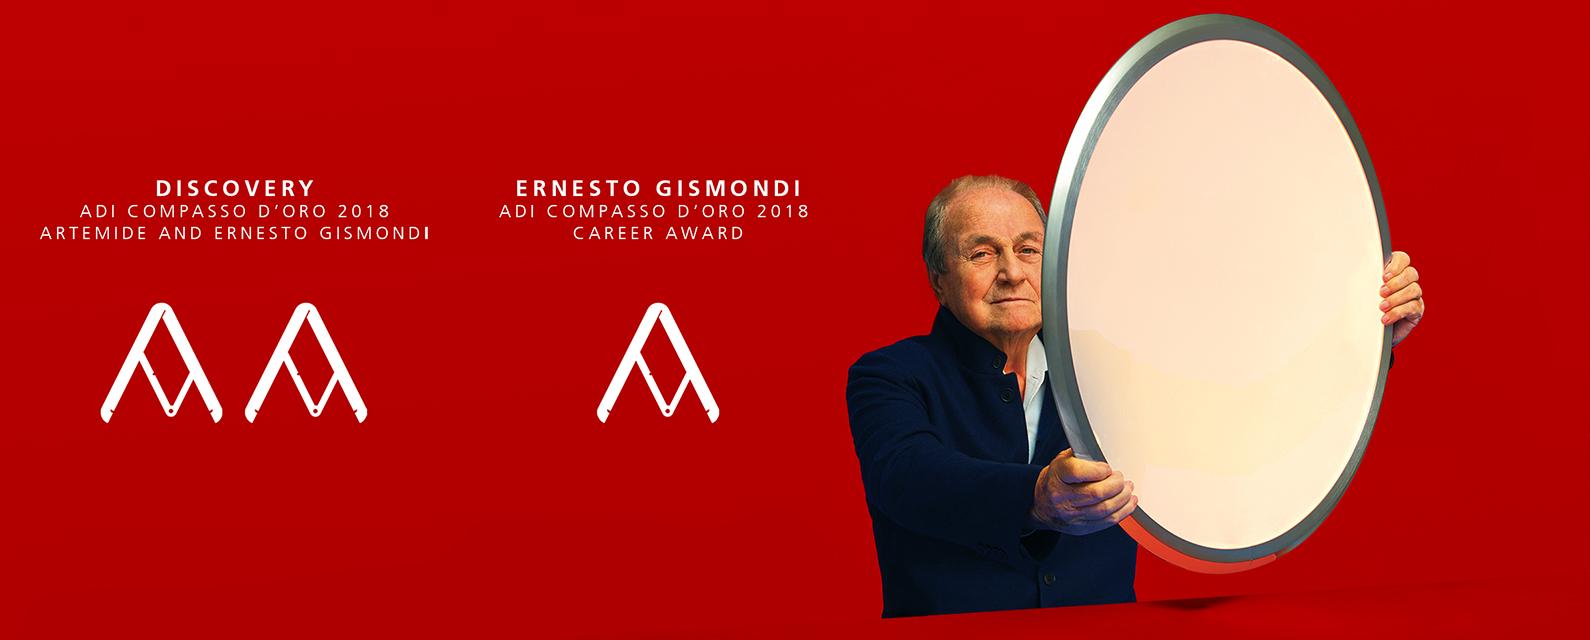 Artemide-ADI-Compasso-ORO-2018_ernesto-gismondi